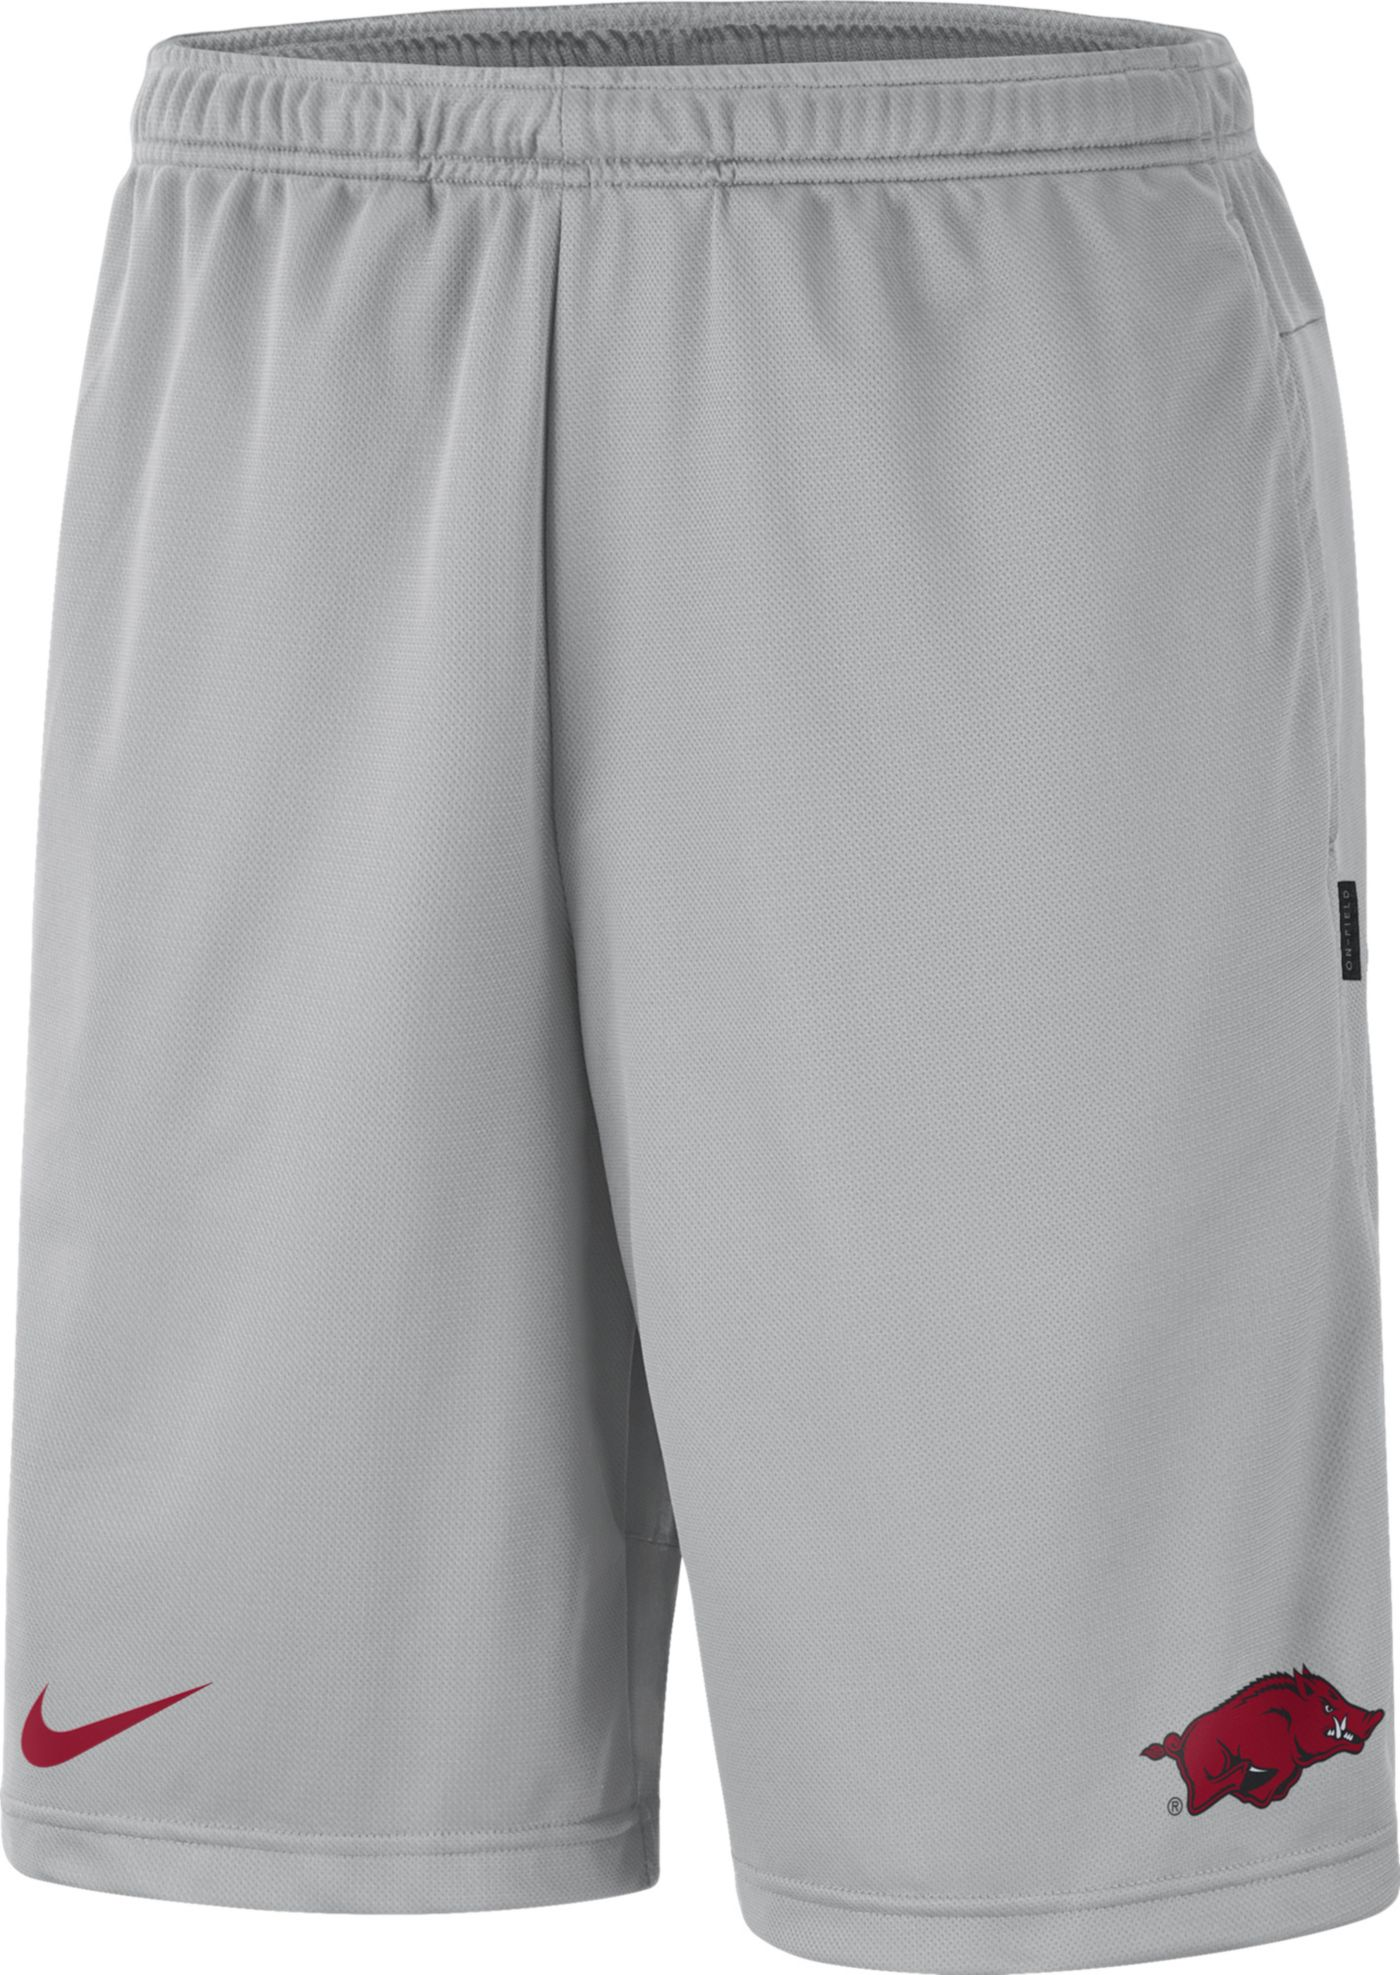 Nike Men's Arkansas Razorbacks Grey Dri-FIT Coach Shorts